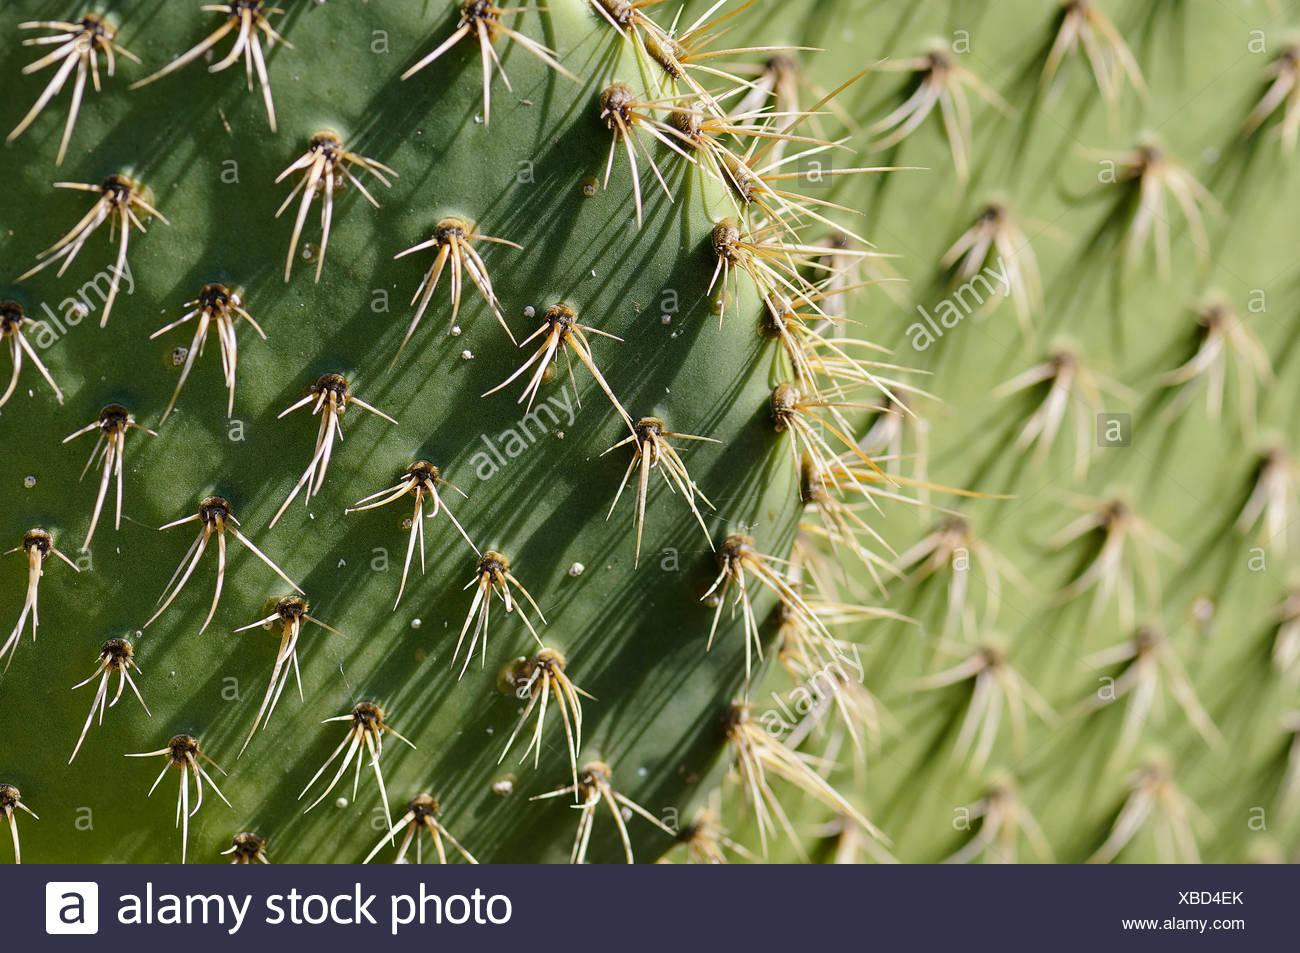 Coastal prickly pear cactus opuntia opuntia littoralis beauty in coastal prickly pear cactus opuntia opuntia littoralis beauty in nature cactus colour creative evergreen spring flowering summer flowering mightylinksfo